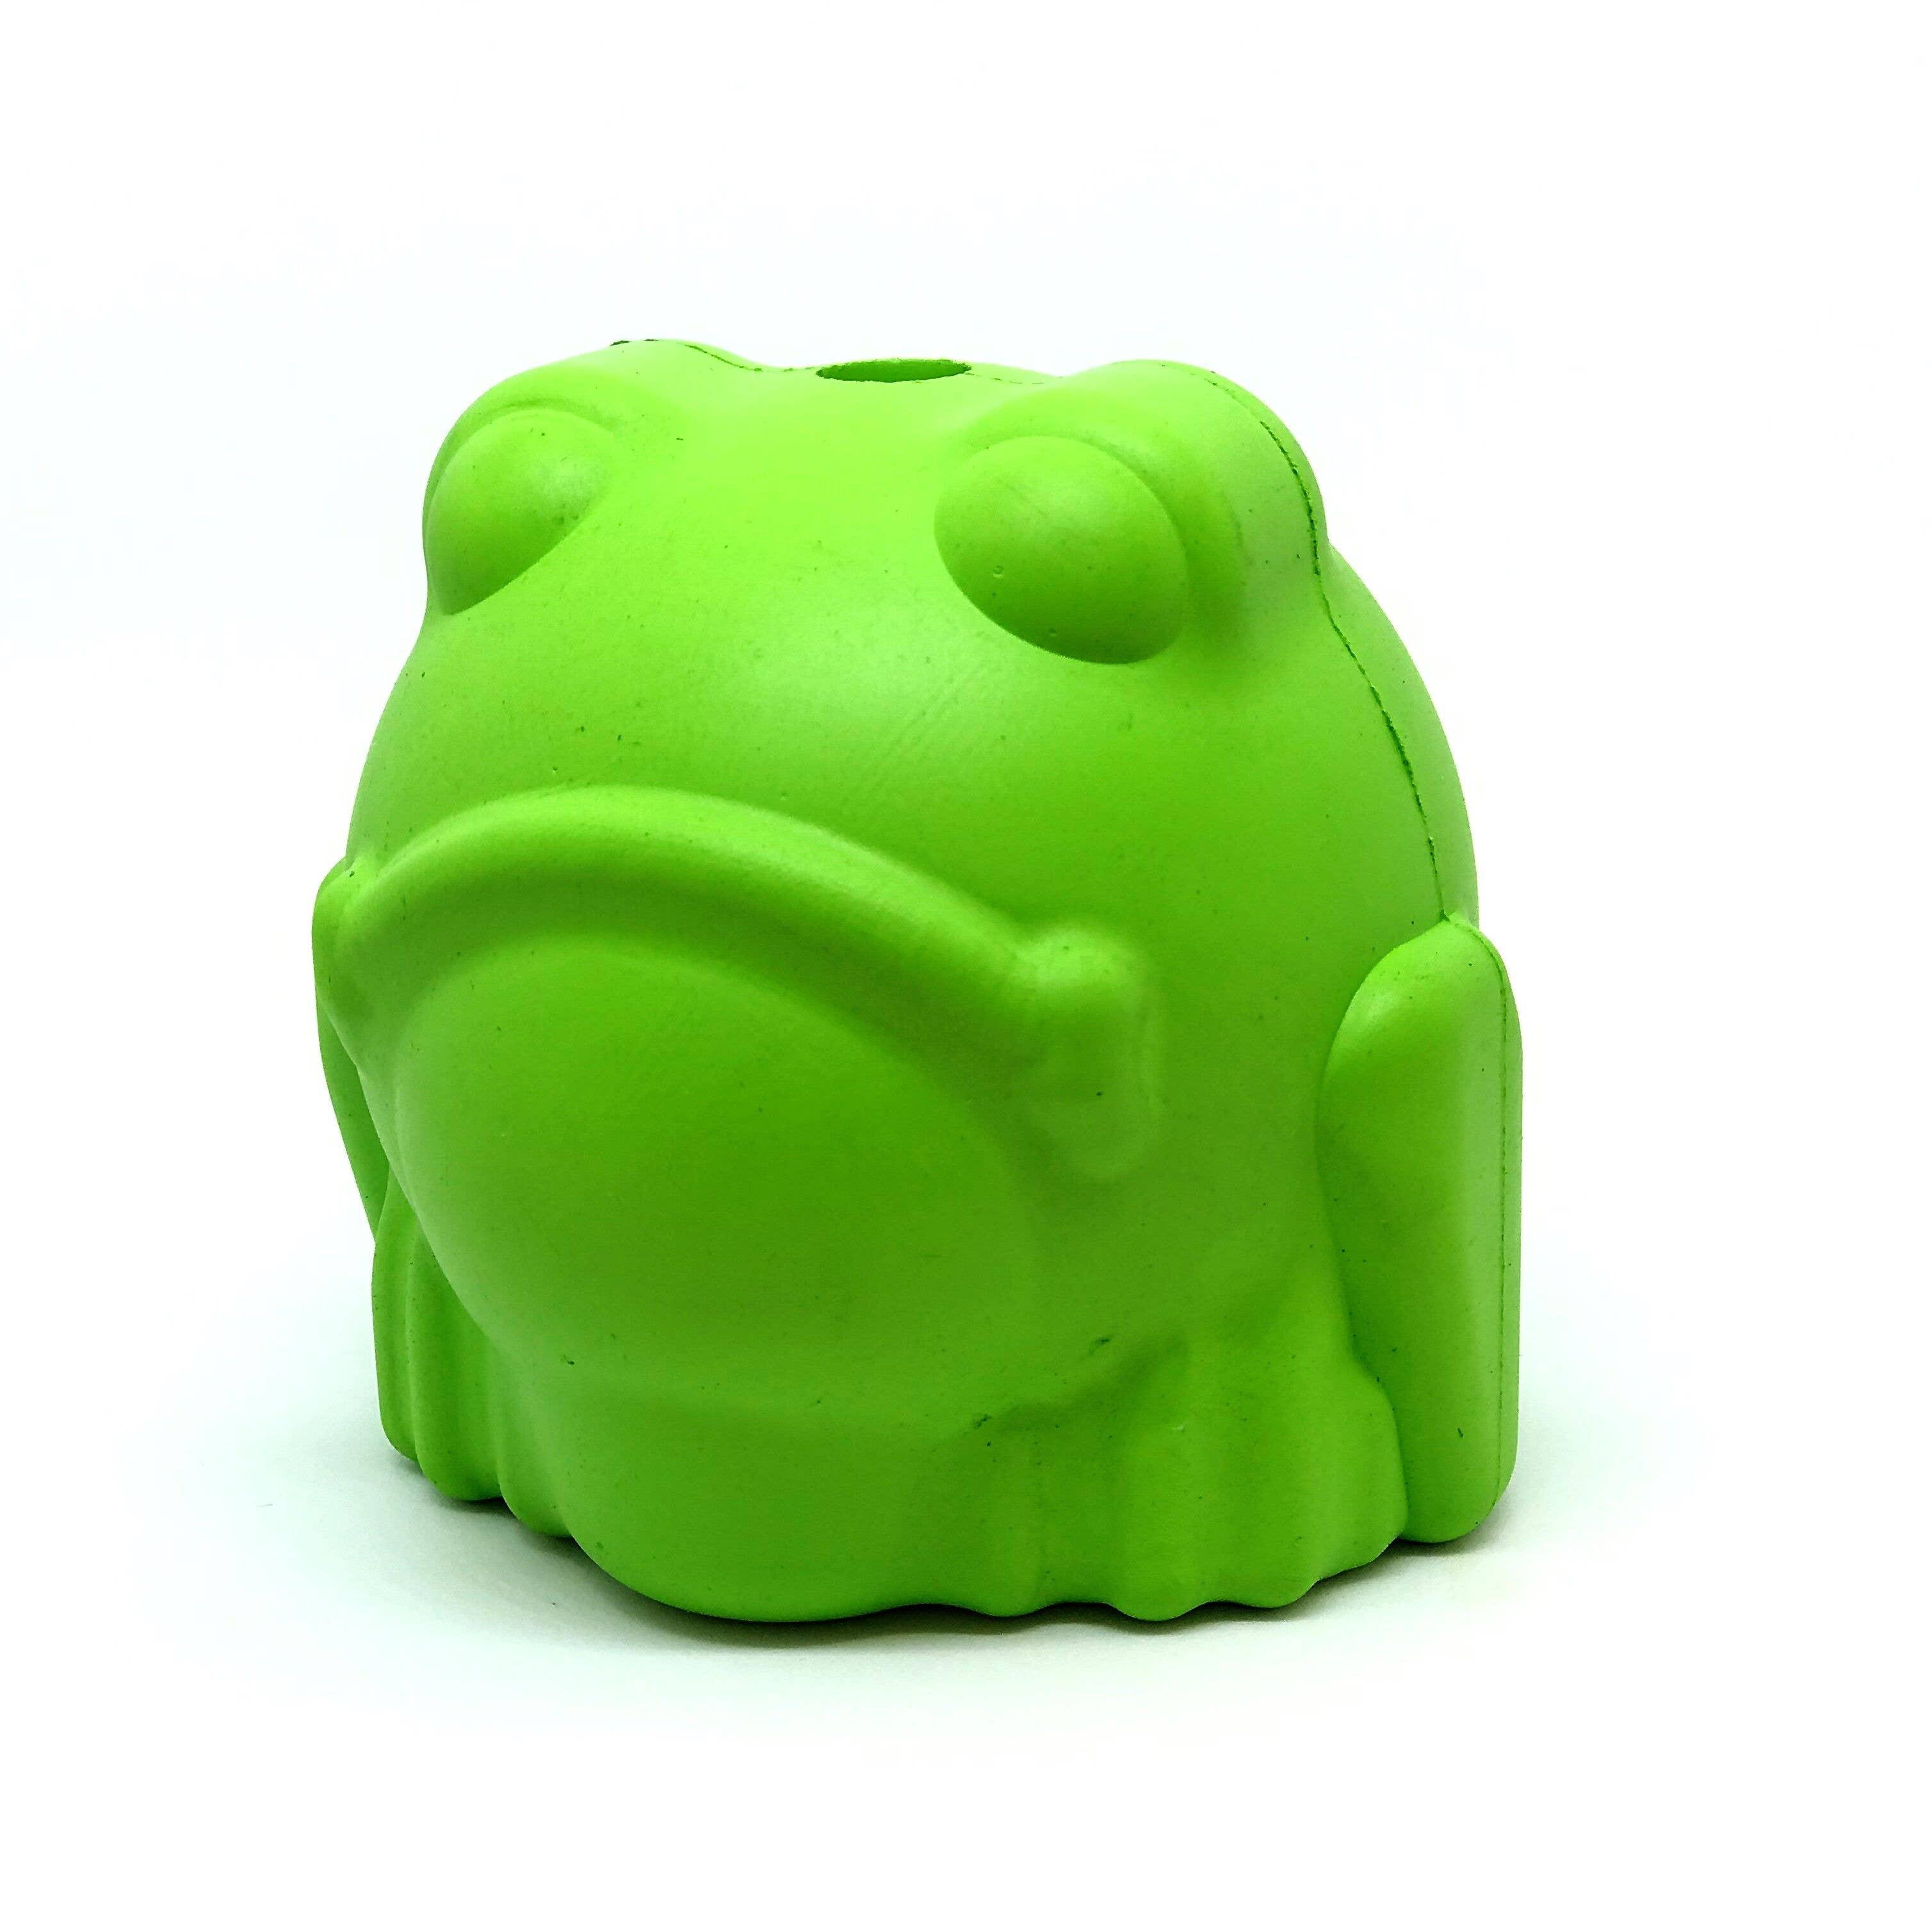 MKB Bull Frog - Chew Toy - Treat Dispenser - Green   Trada Marketplace